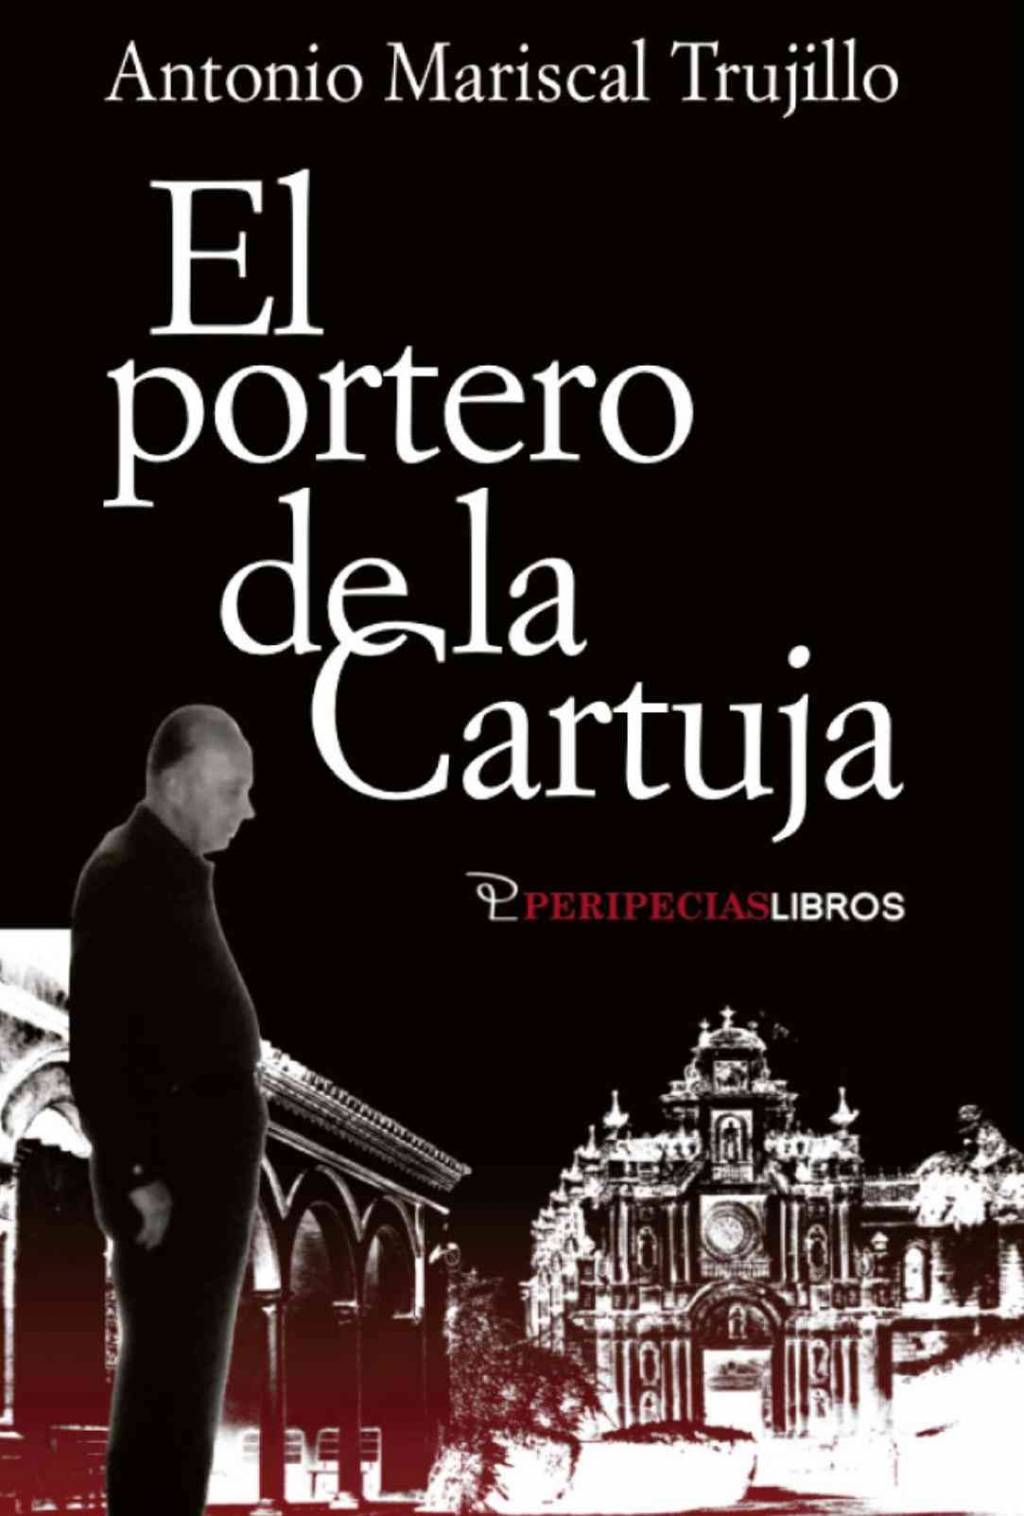 El portero de La Cartuja